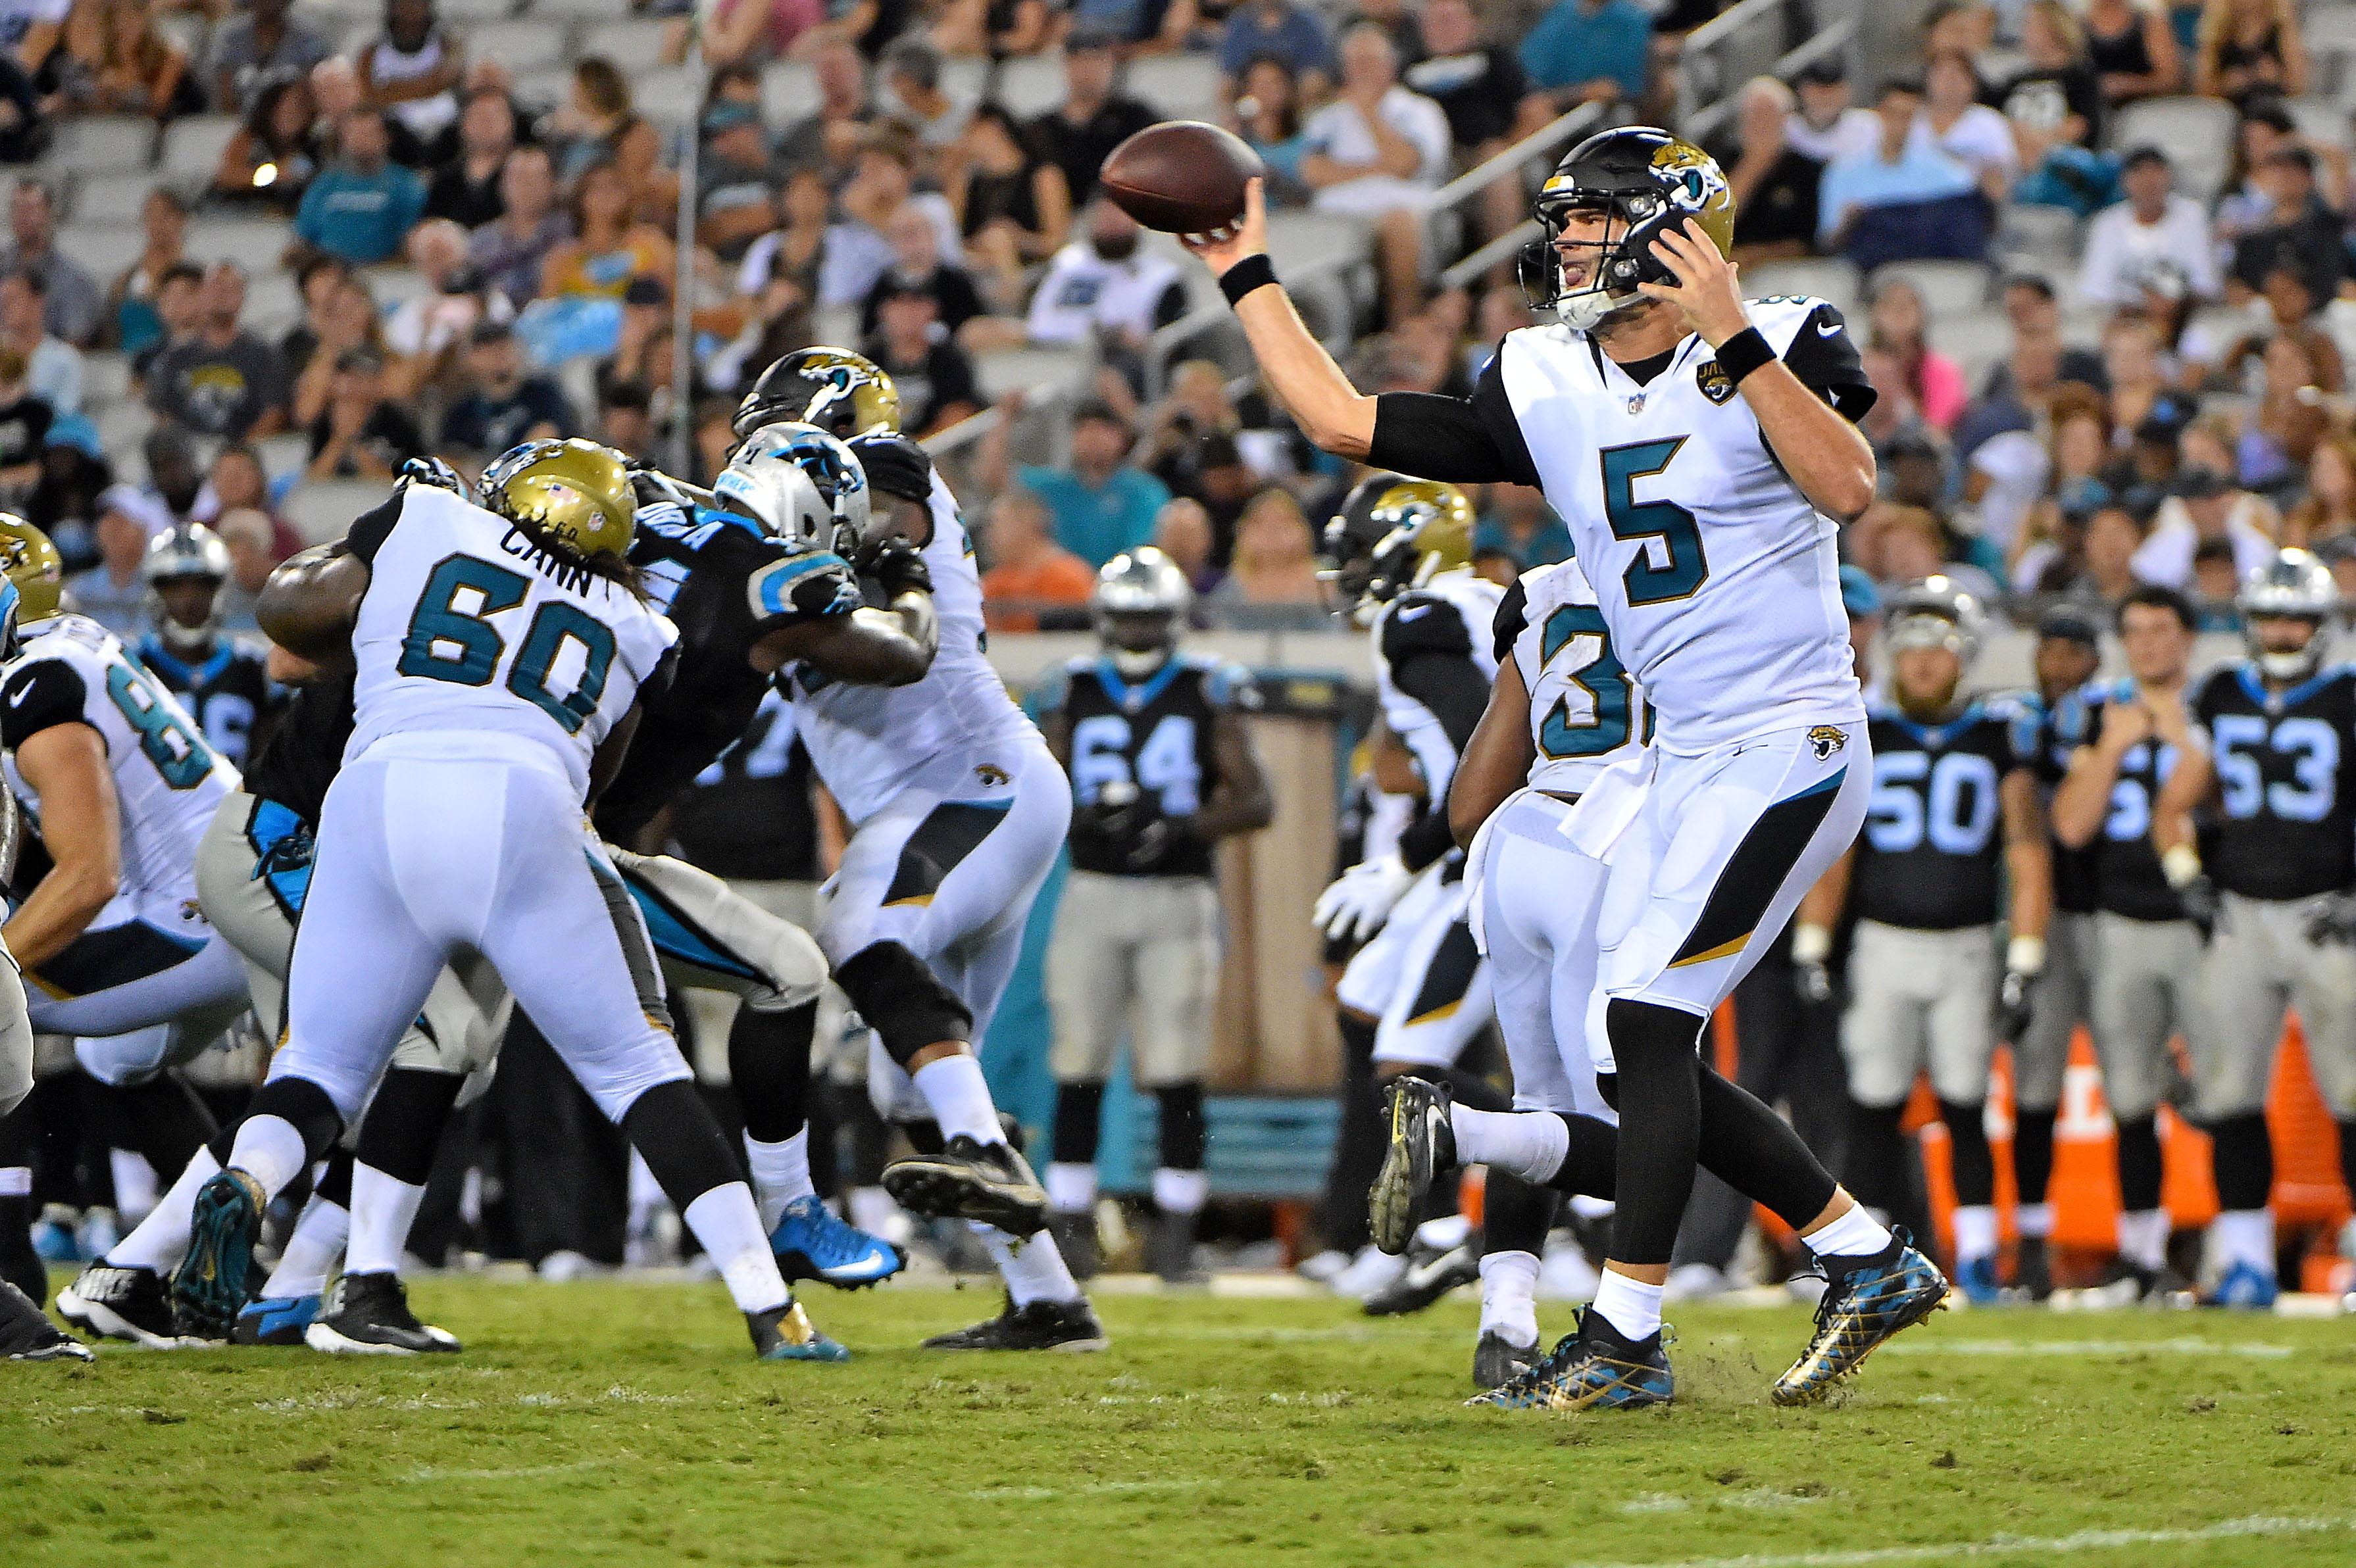 NFL: Carolina Panthers at Jacksonville Jaguars